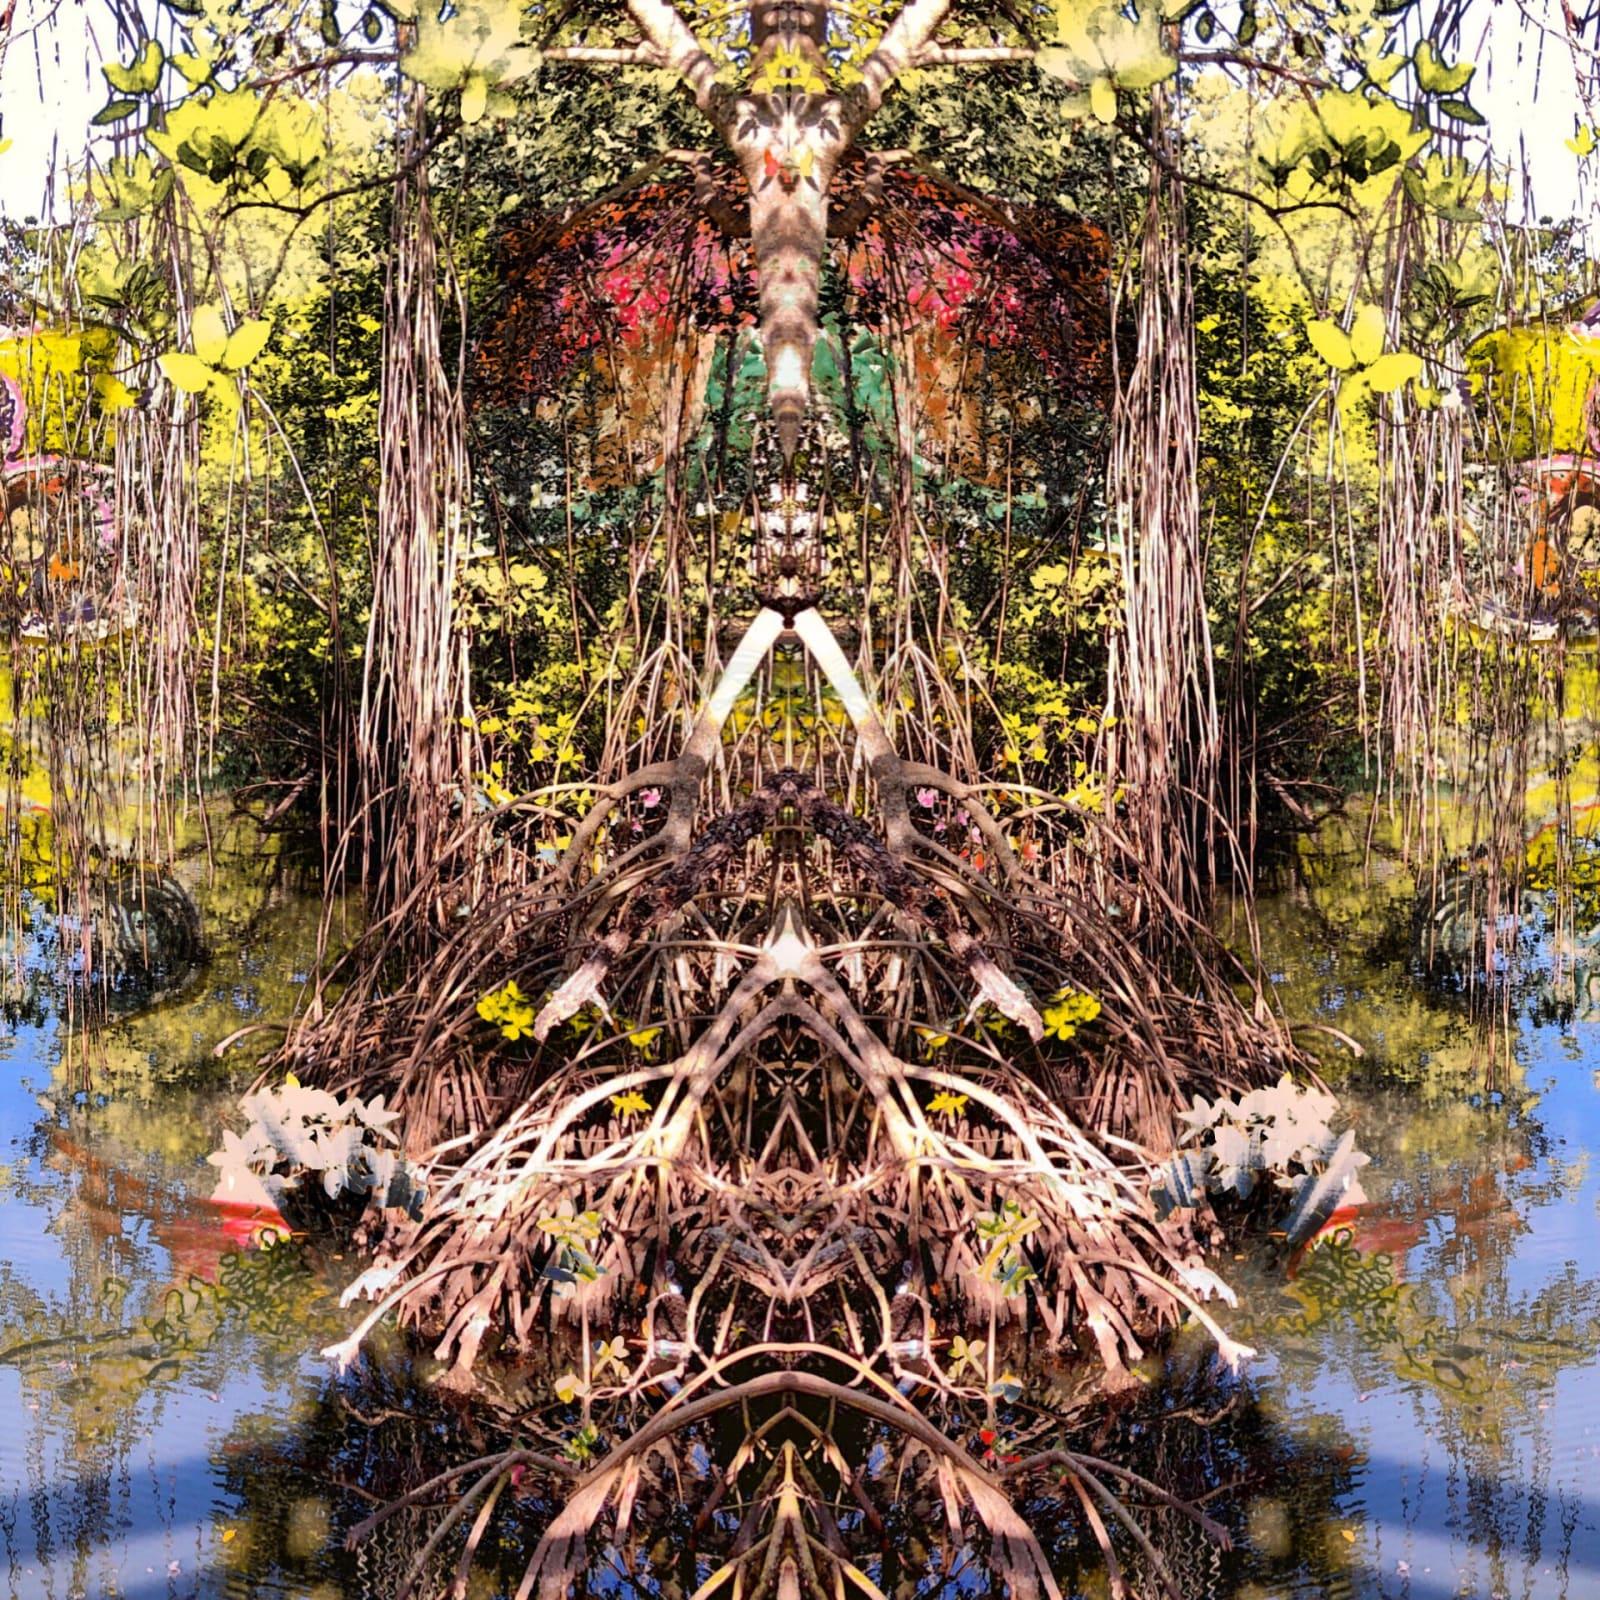 Khotan Fernandez. Enchanted Forest 7, 2019. Acrylic, Matte Medium, Inkjet on Canvas Mounted on Framed Wood Panel. 12 x12 inches